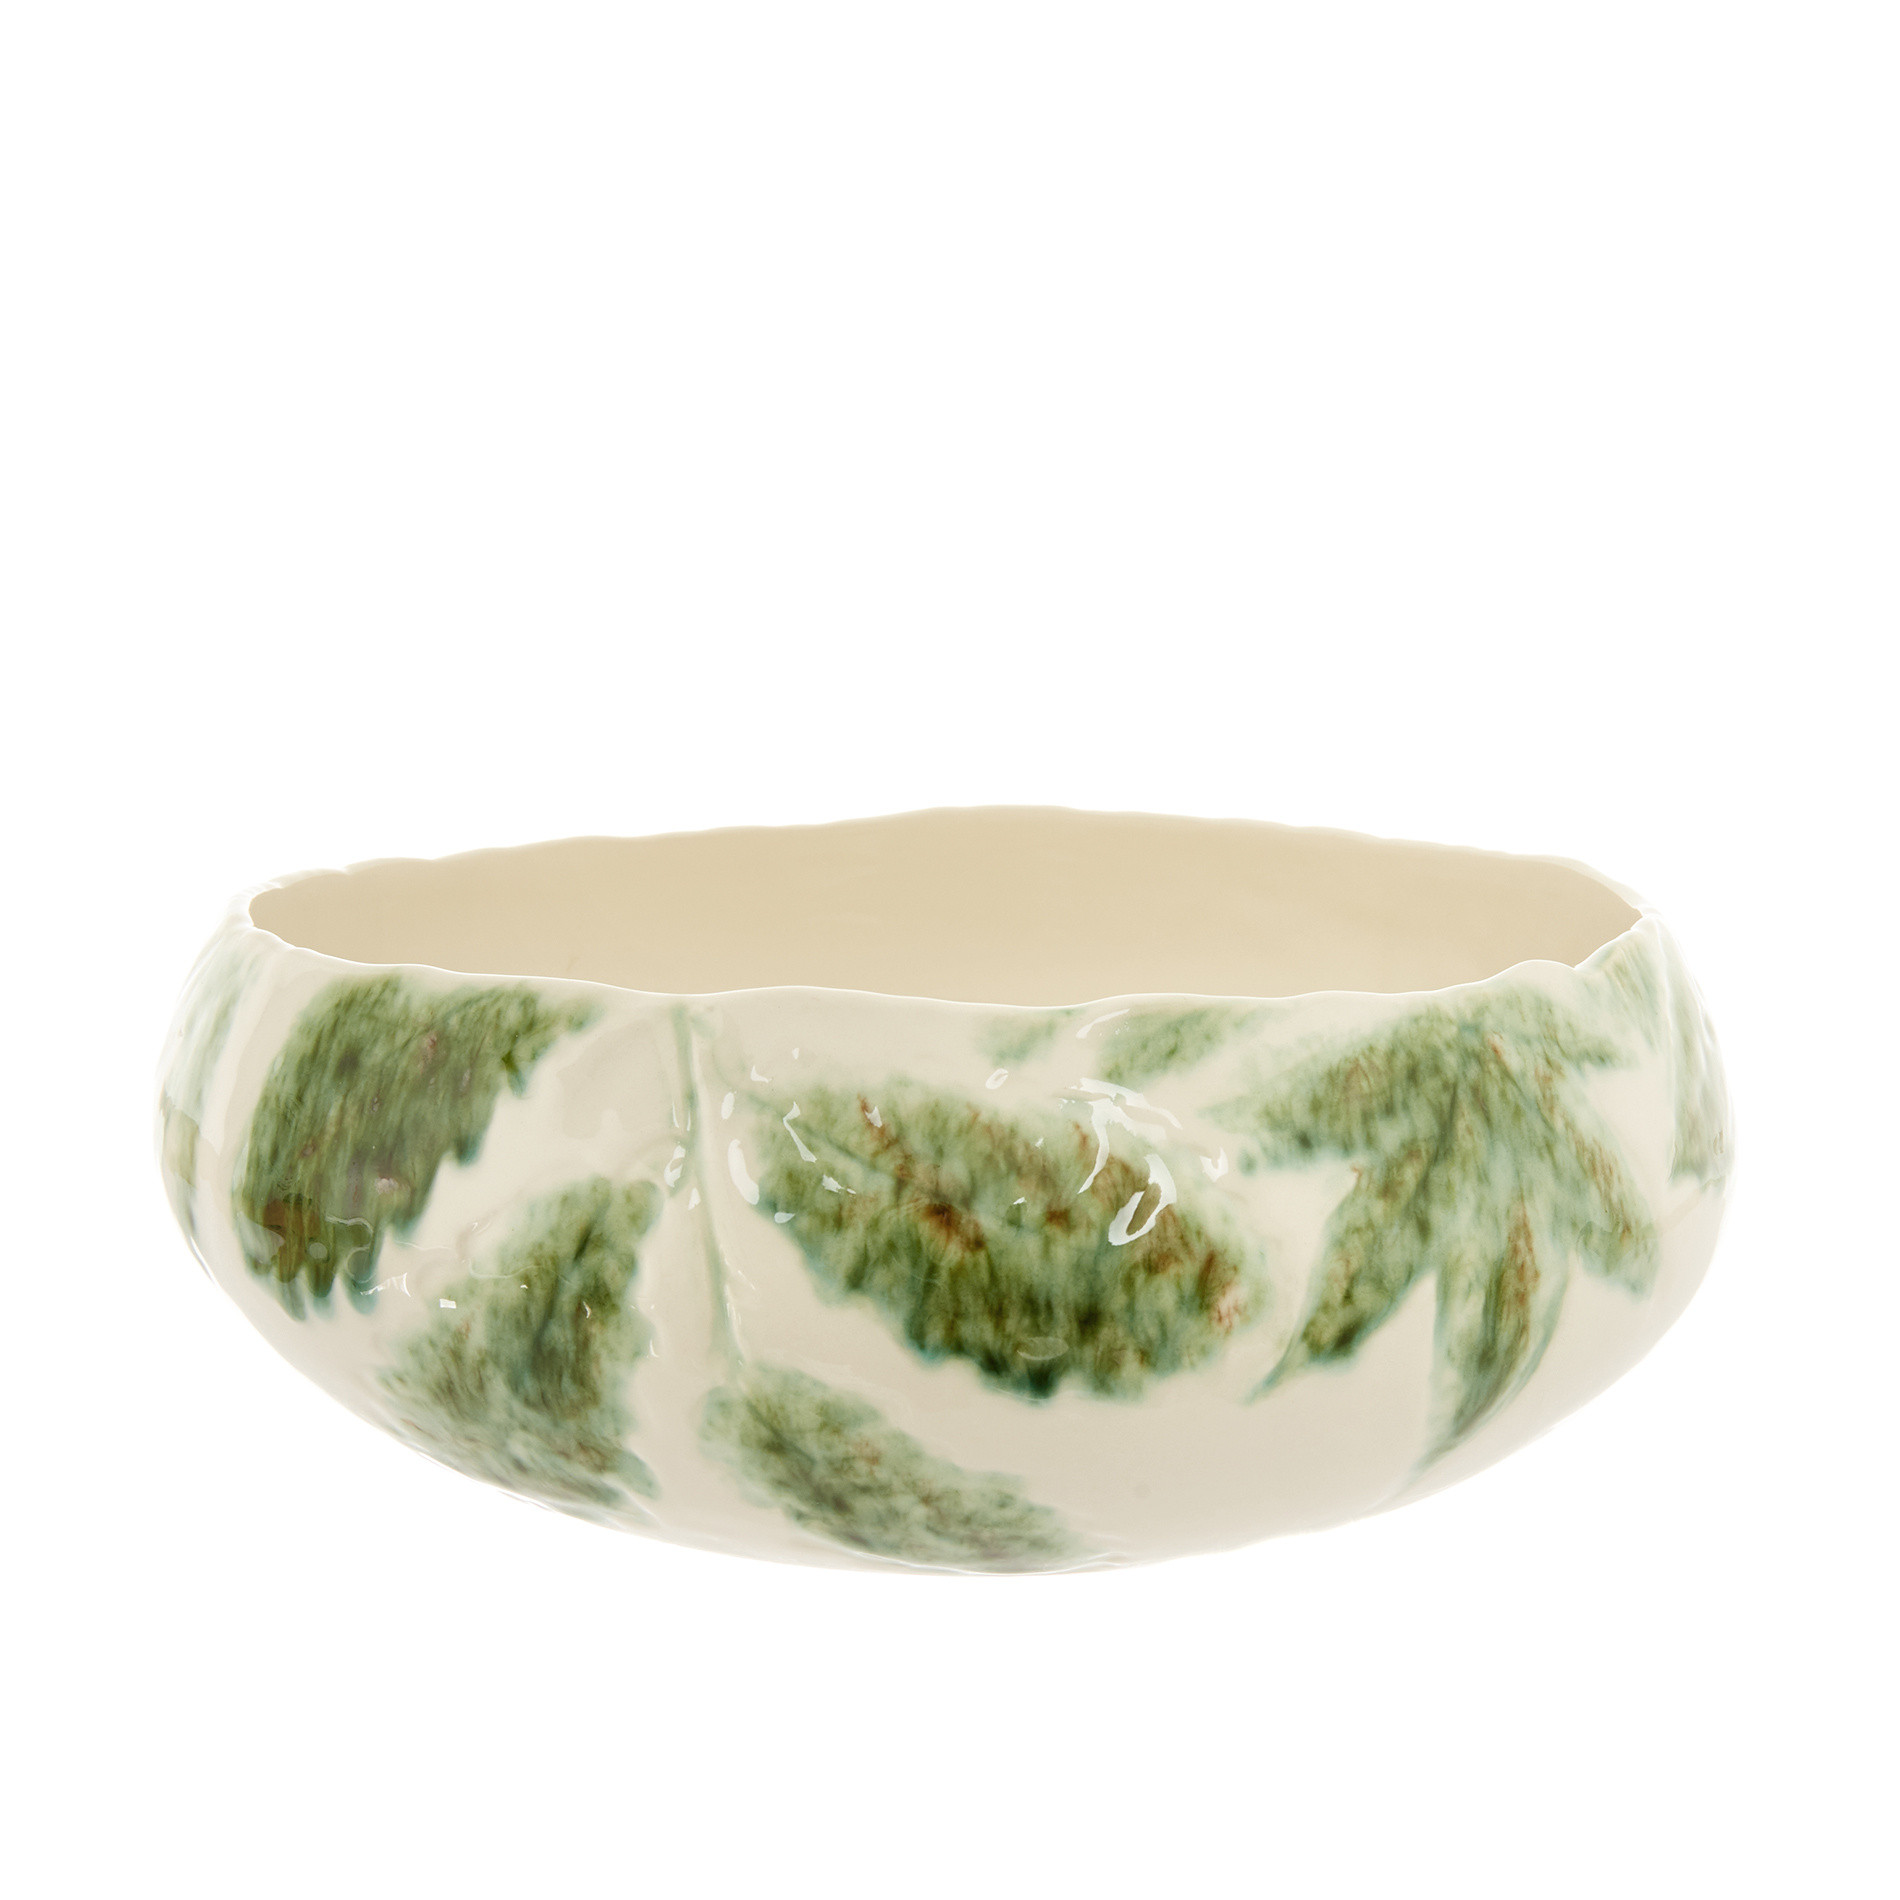 Insalatiera ceramica motivo foglie, Bianco, large image number 0